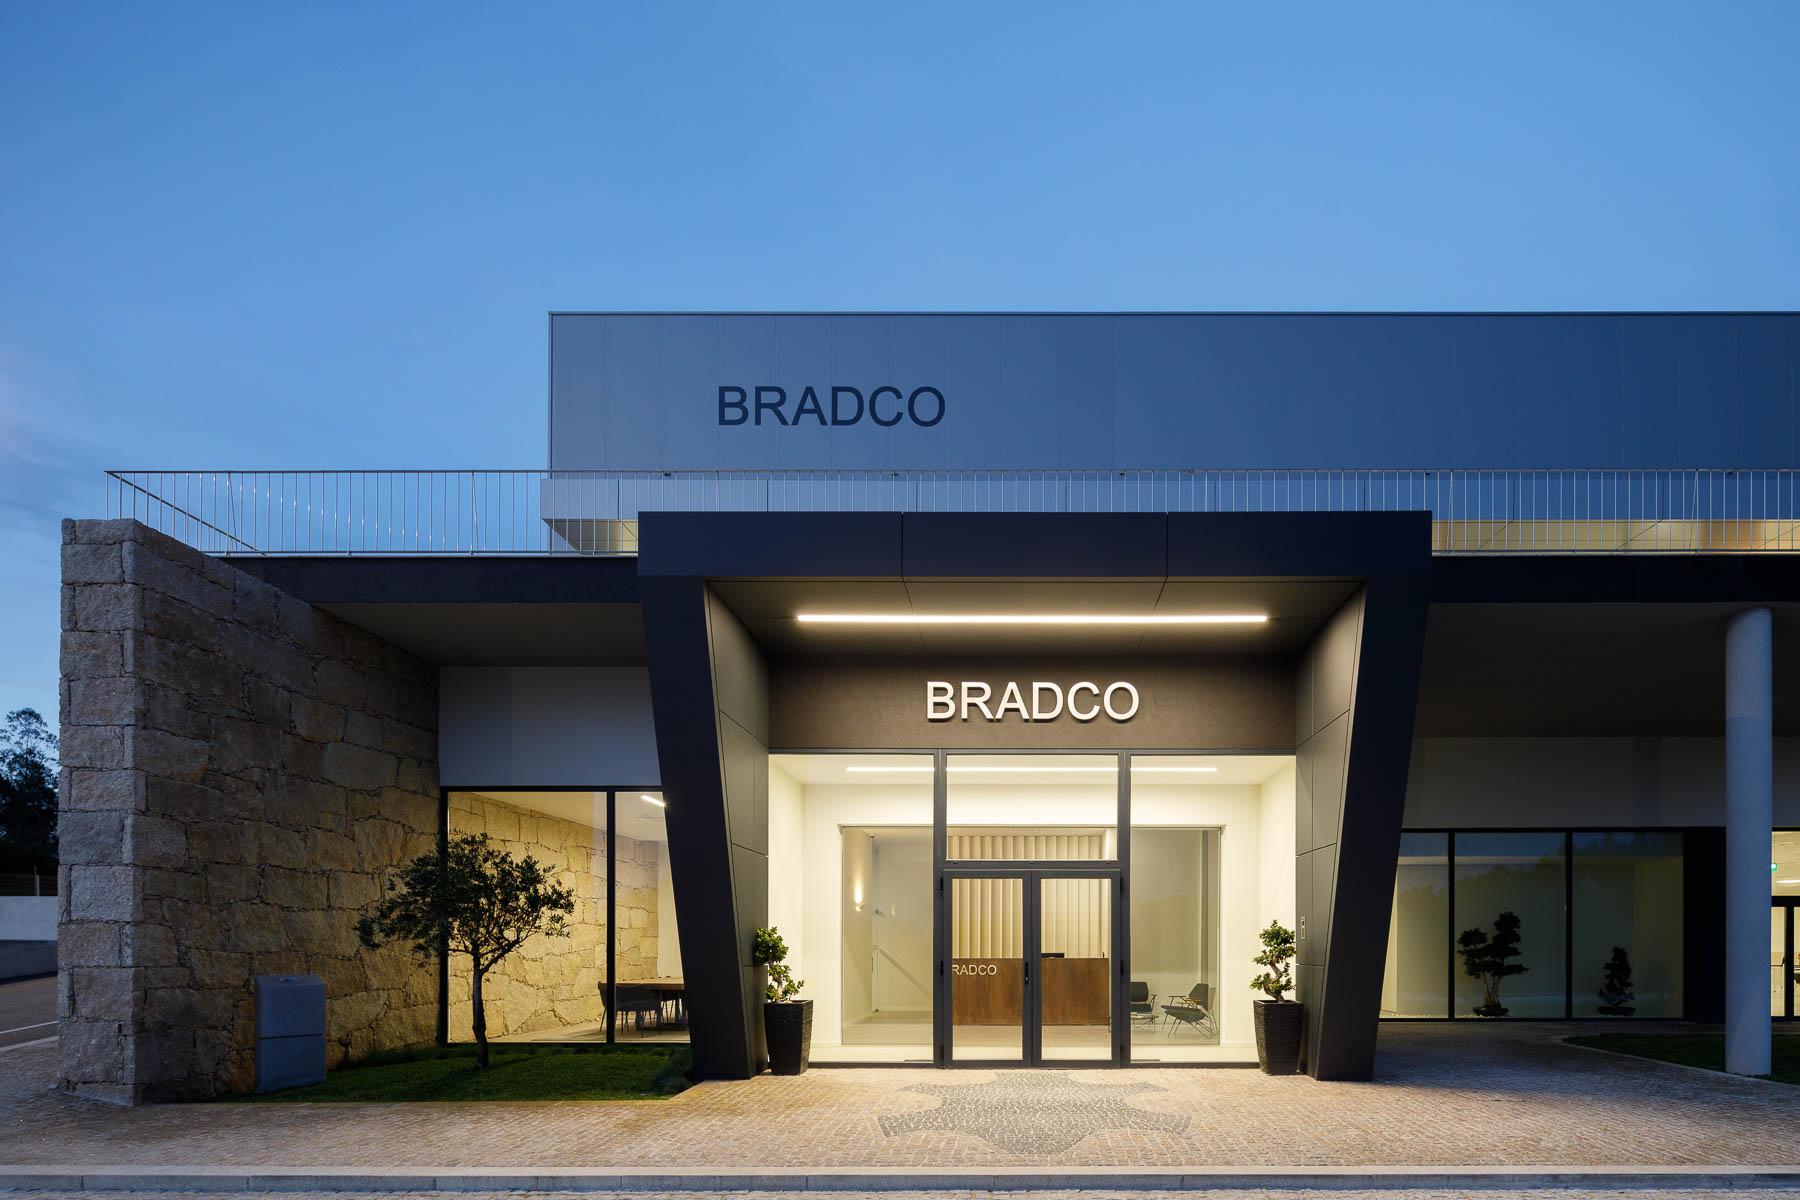 Edificio Industrial de Escitorios da Bradco em Castelo de Paiva